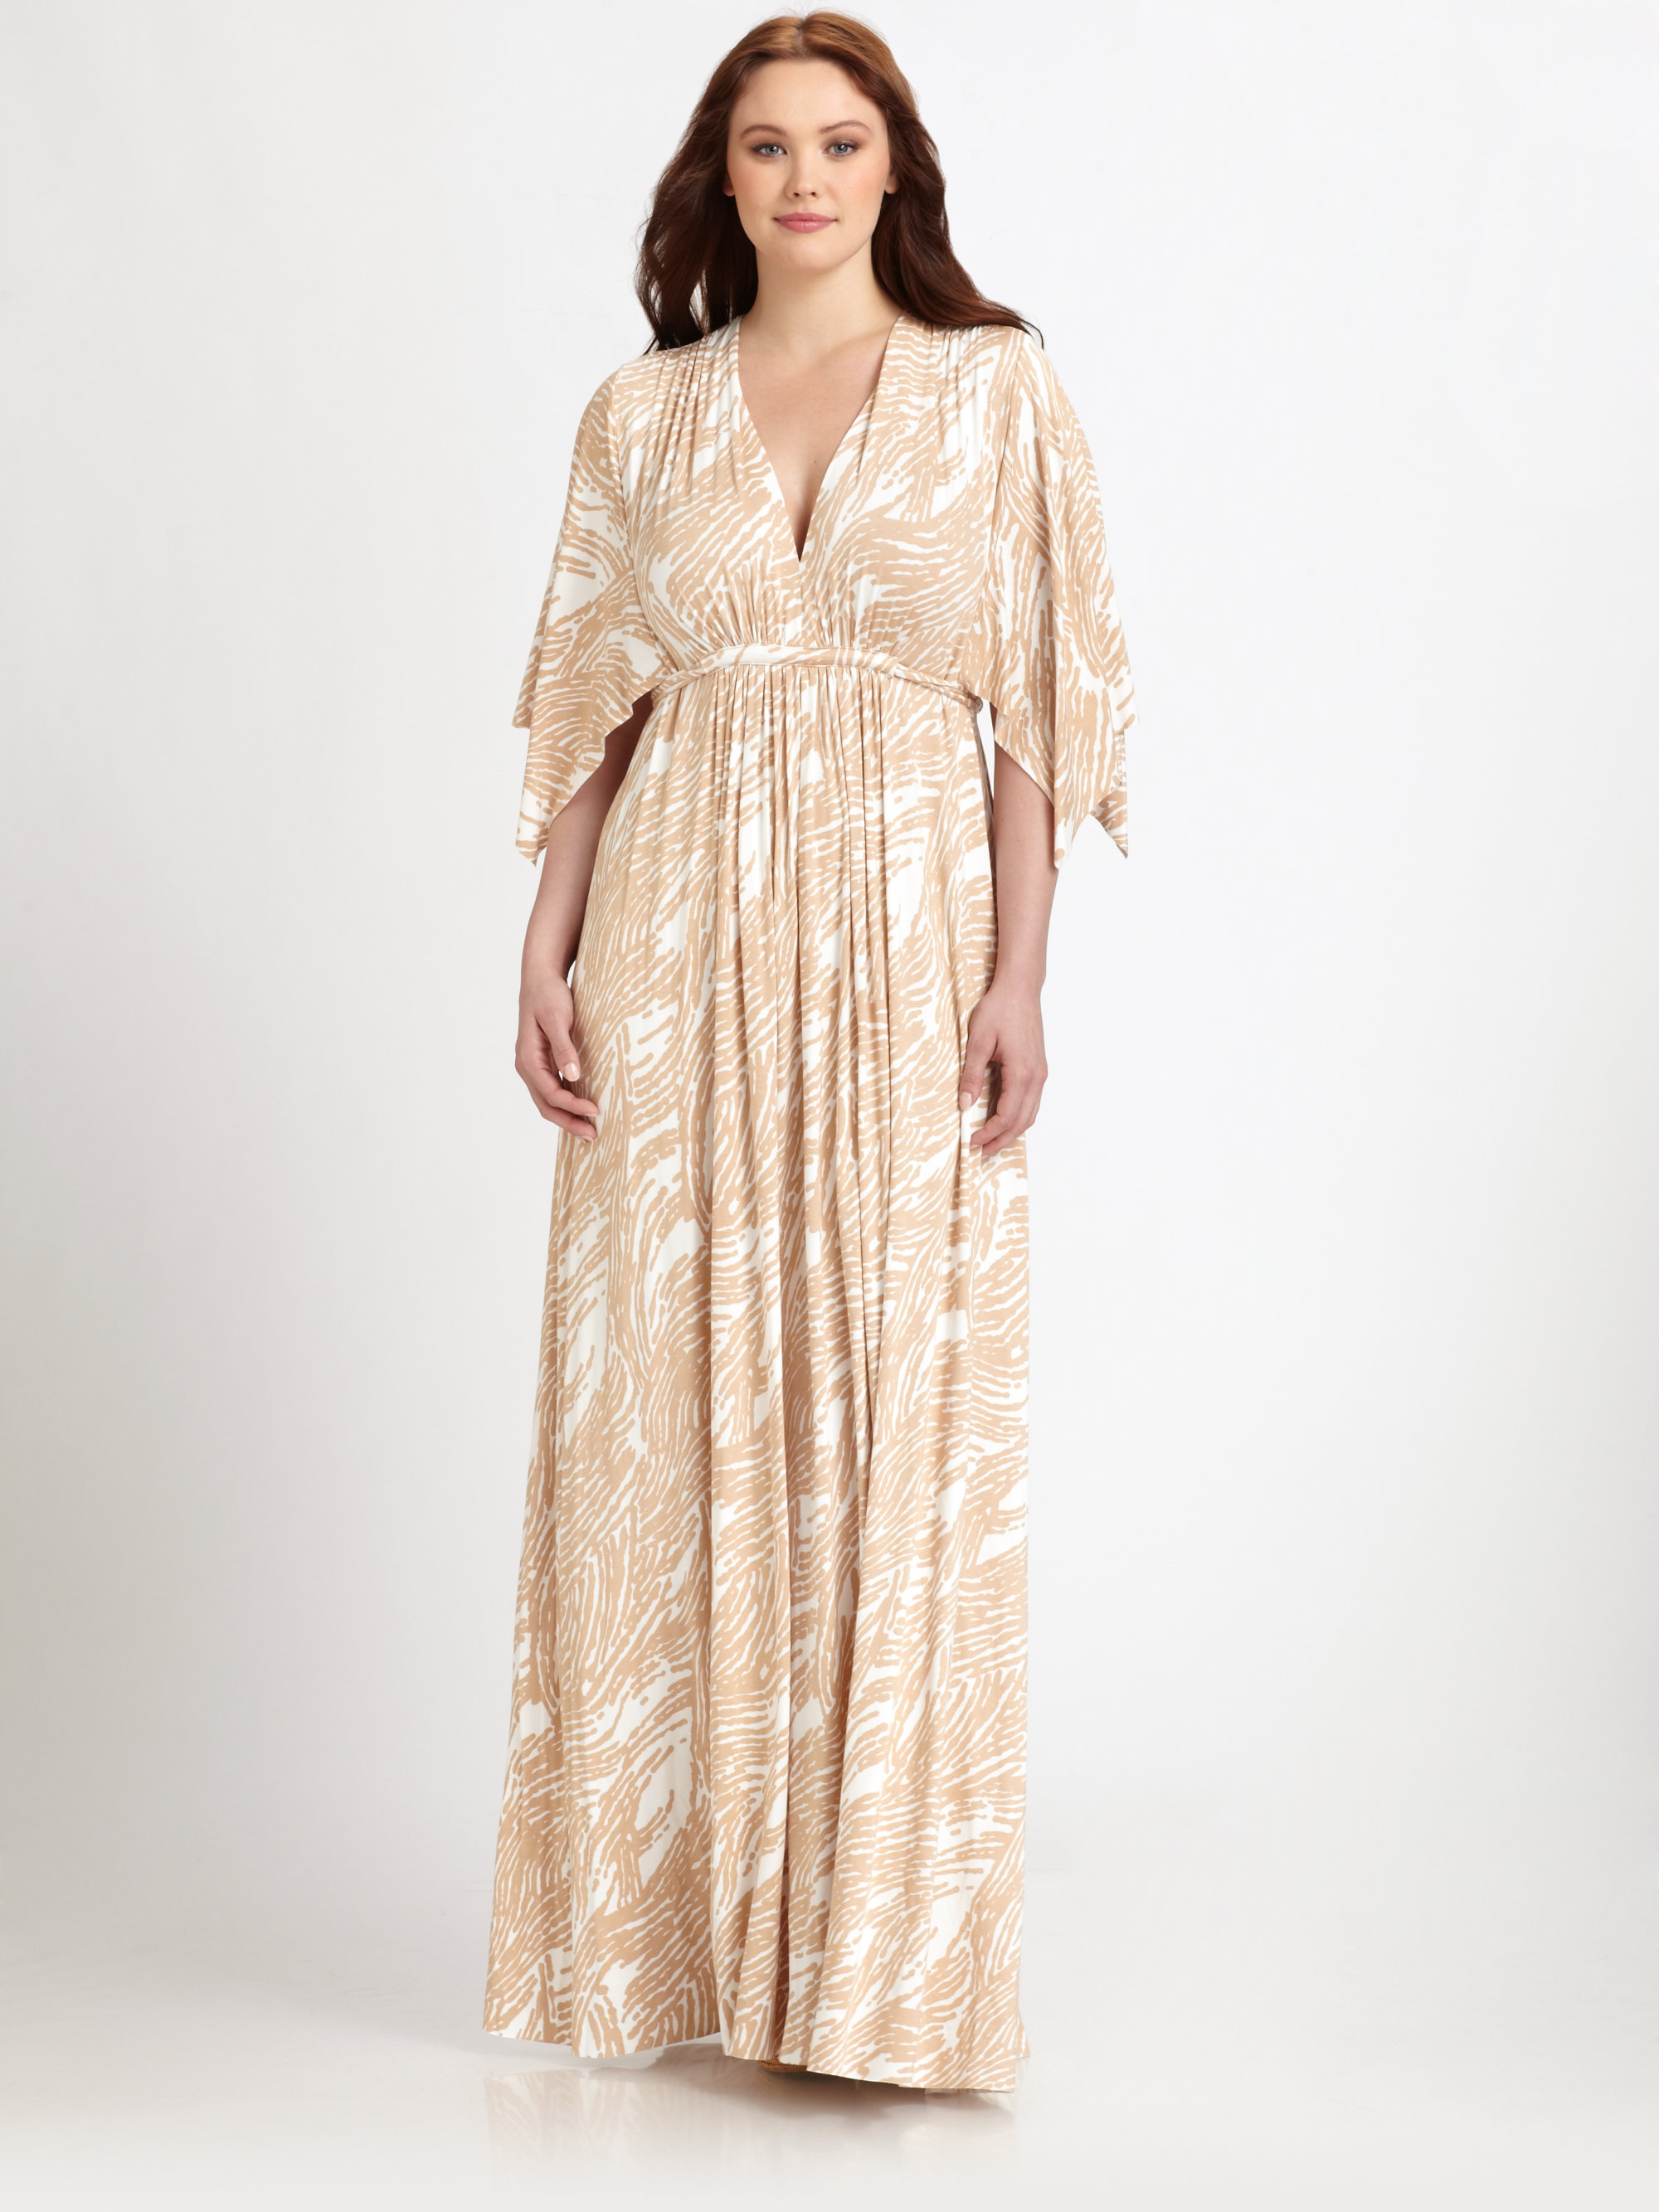 ddc2edfc741 Rachel Pally Printed Long Caftan Dress in Natural - Lyst